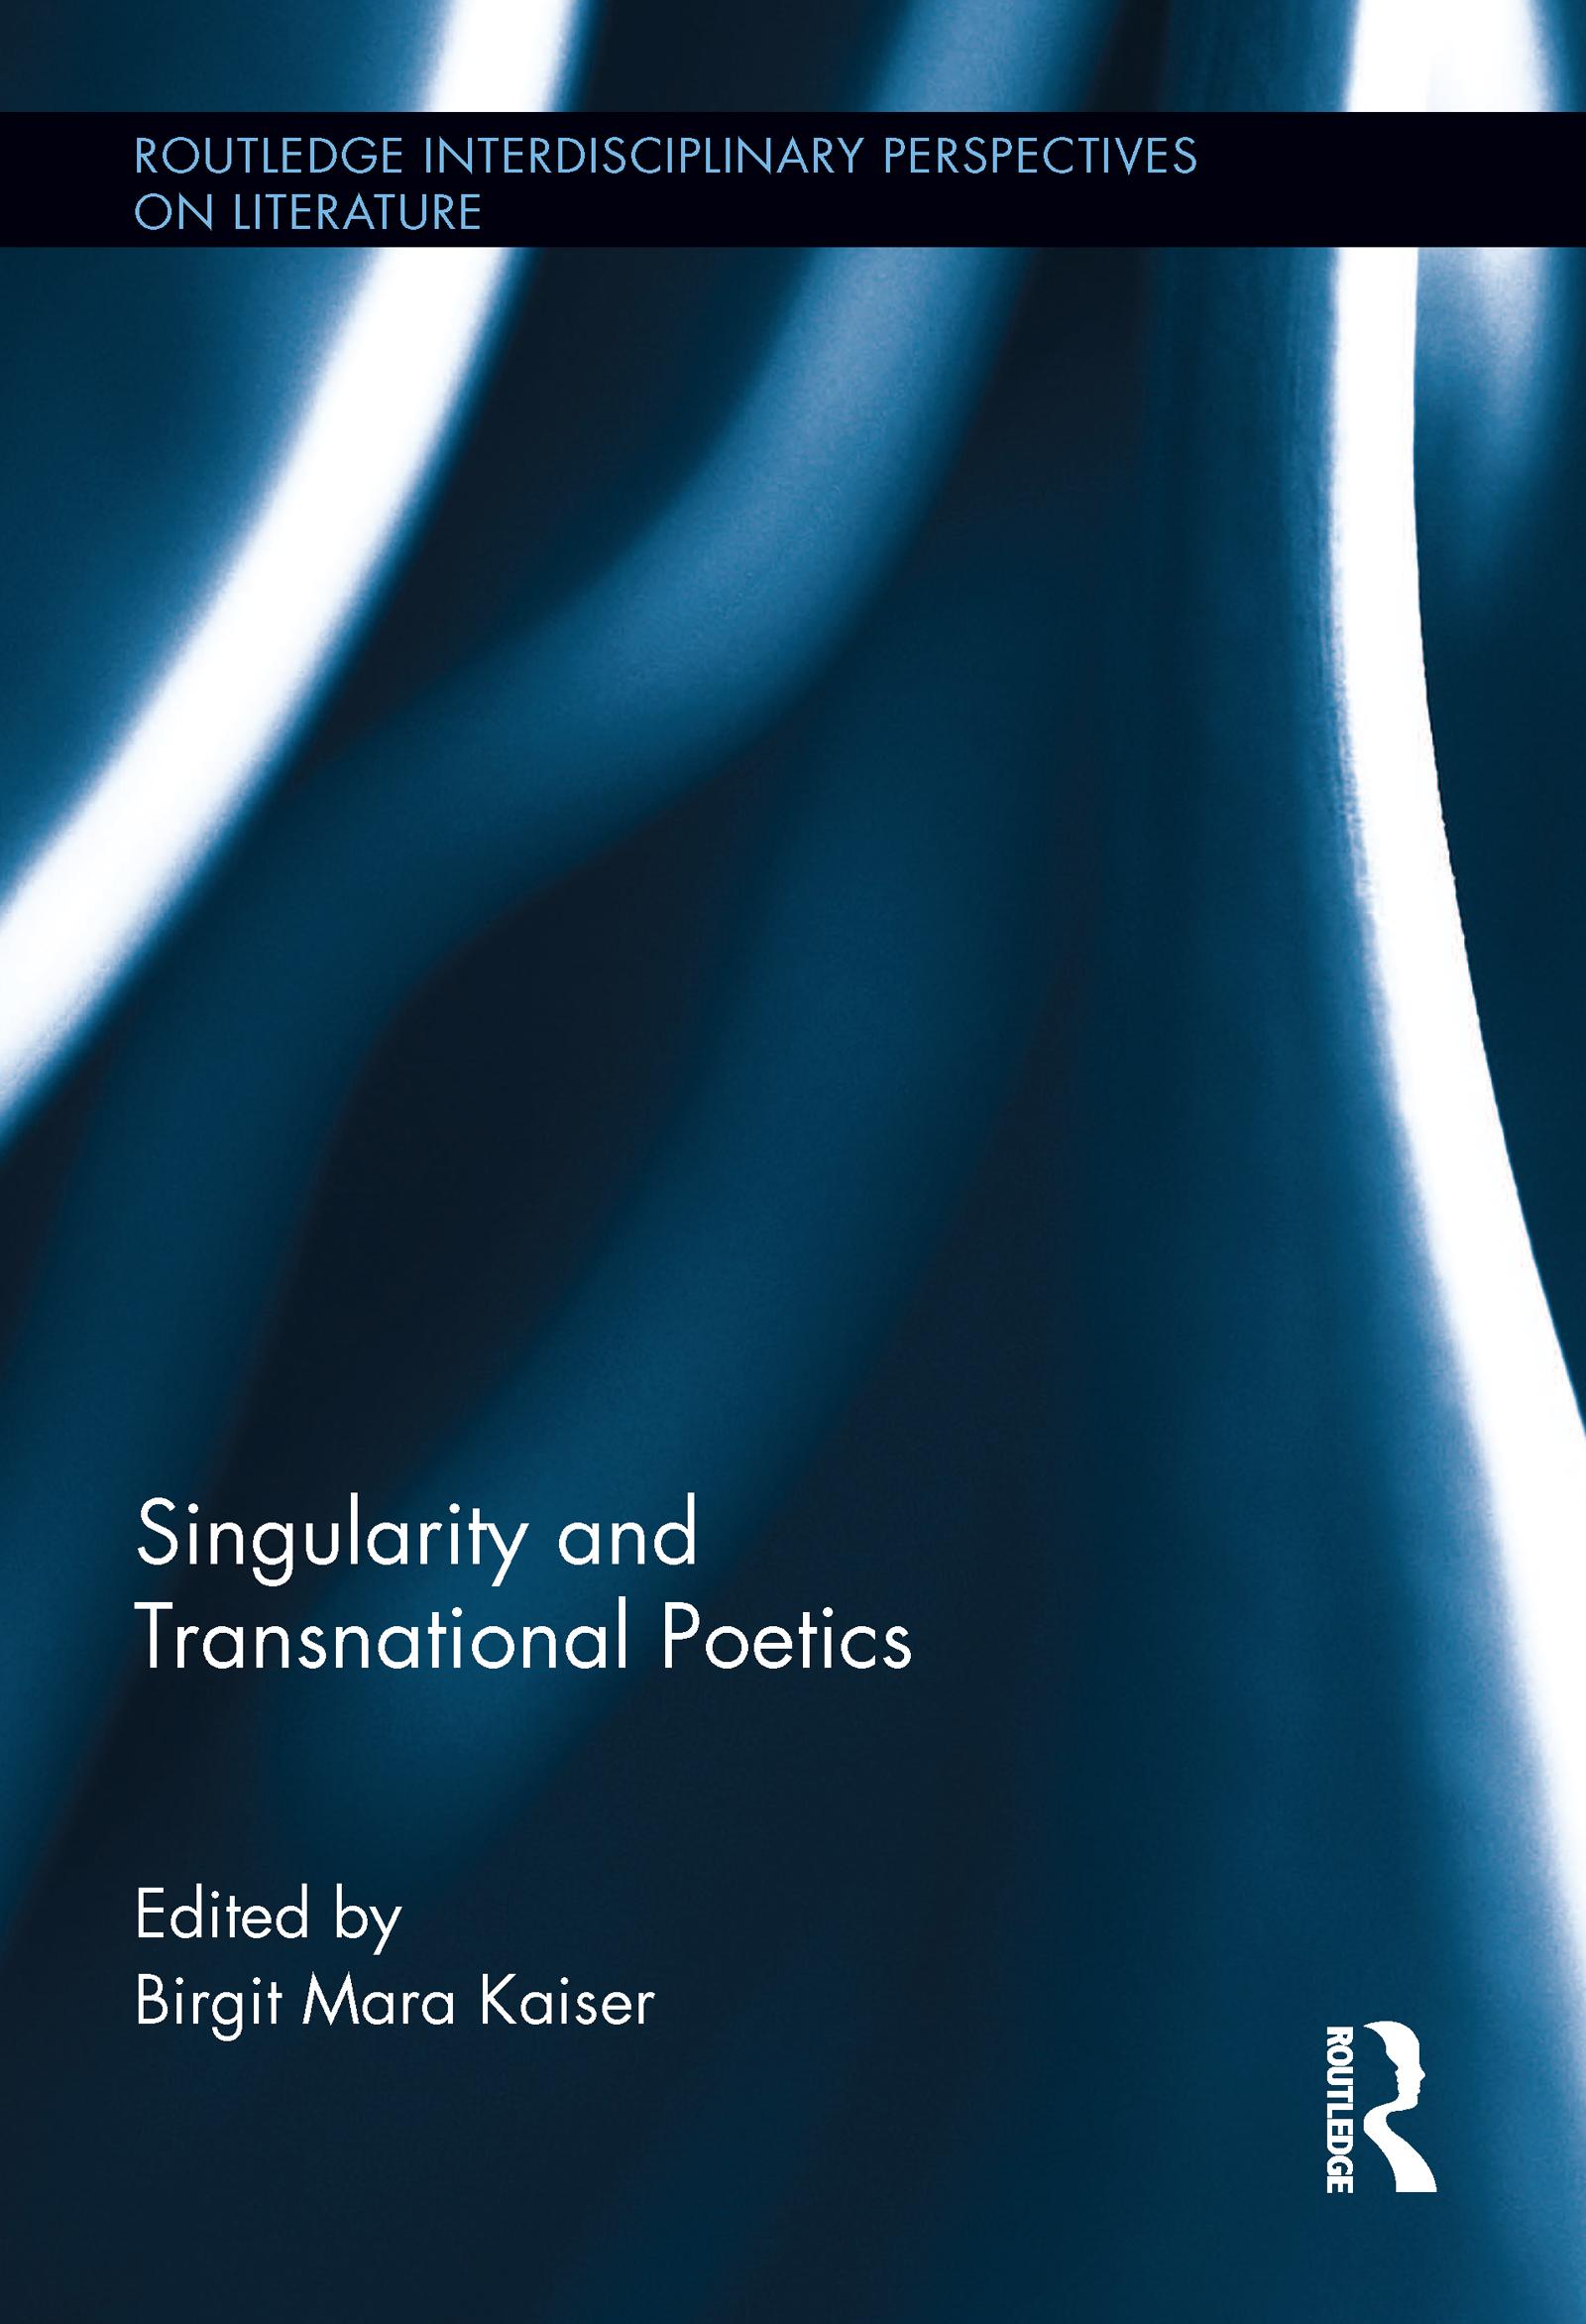 Singularity and Transnational Poetics